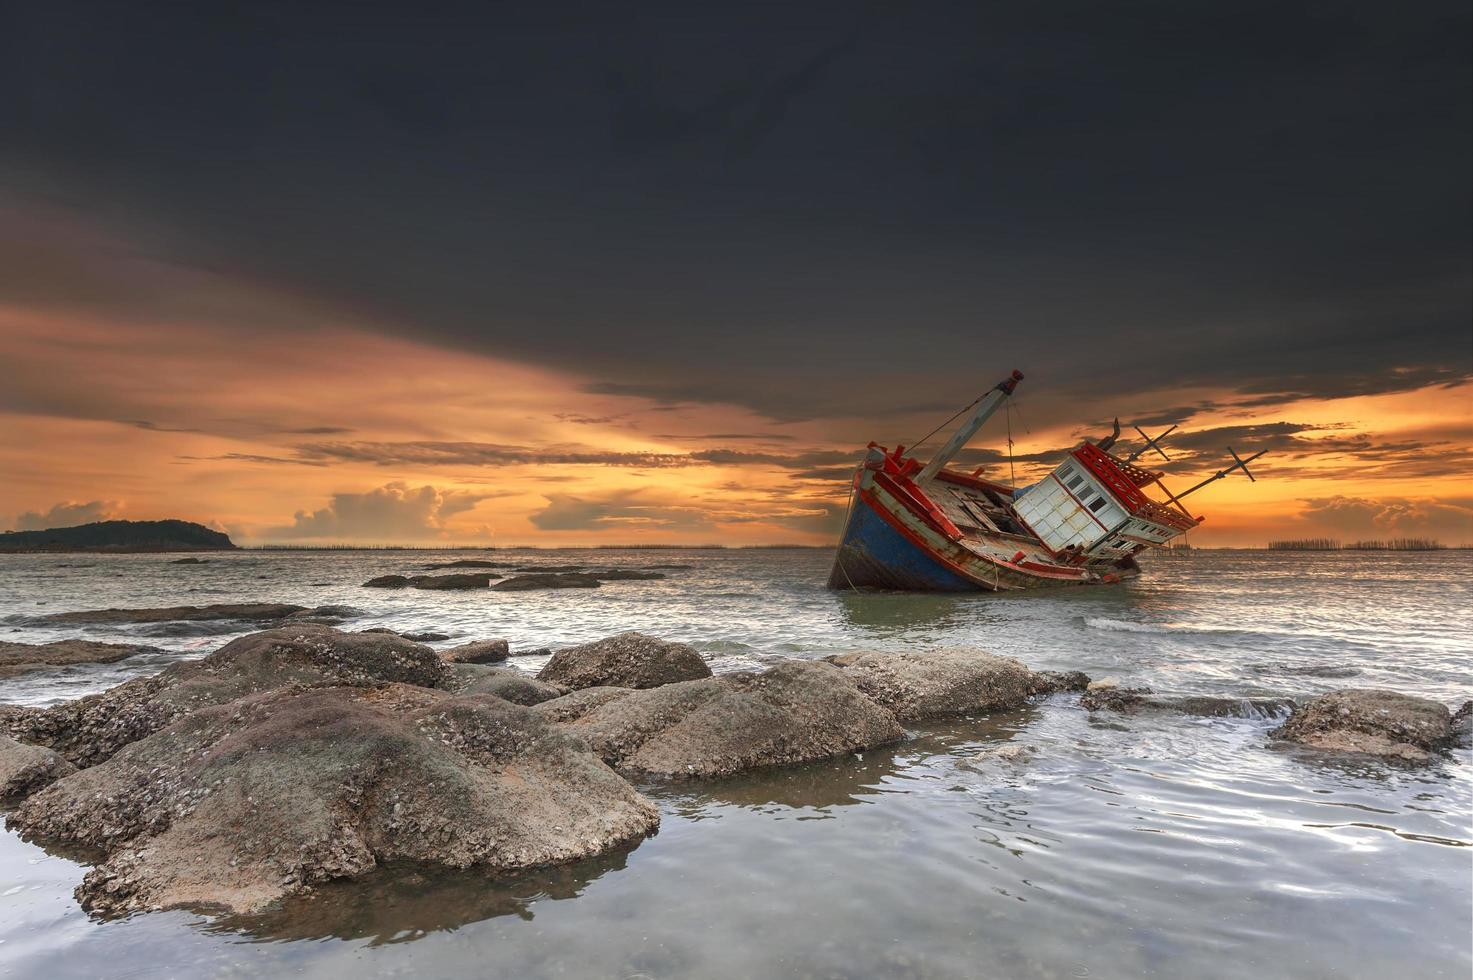 naufrage à chonburi, thaïlande photo